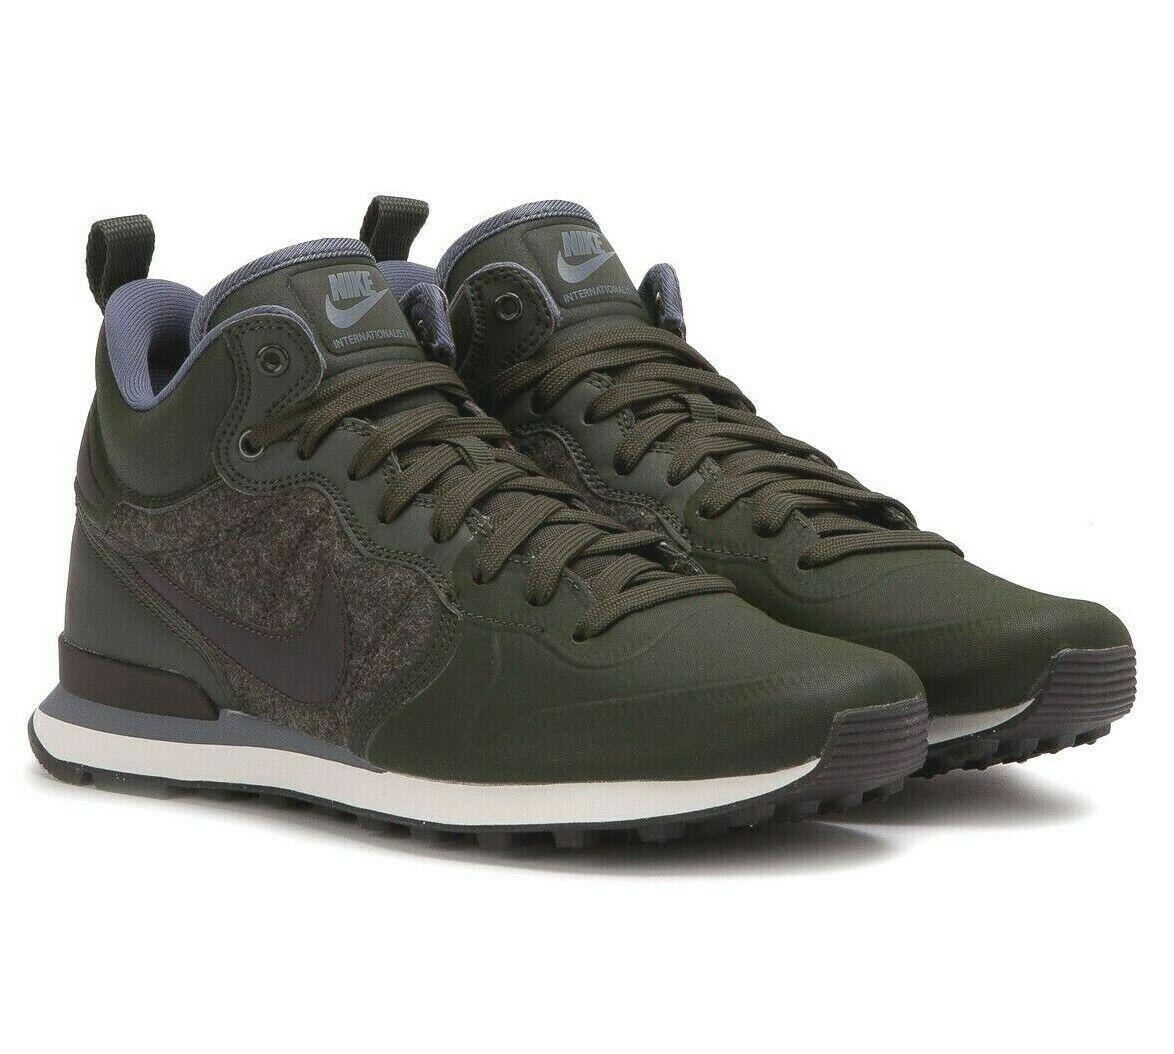 presenting more photos top fashion Nike Internationalist Utility Sequoia Velvet Brown 857937 301 Mens Shoes